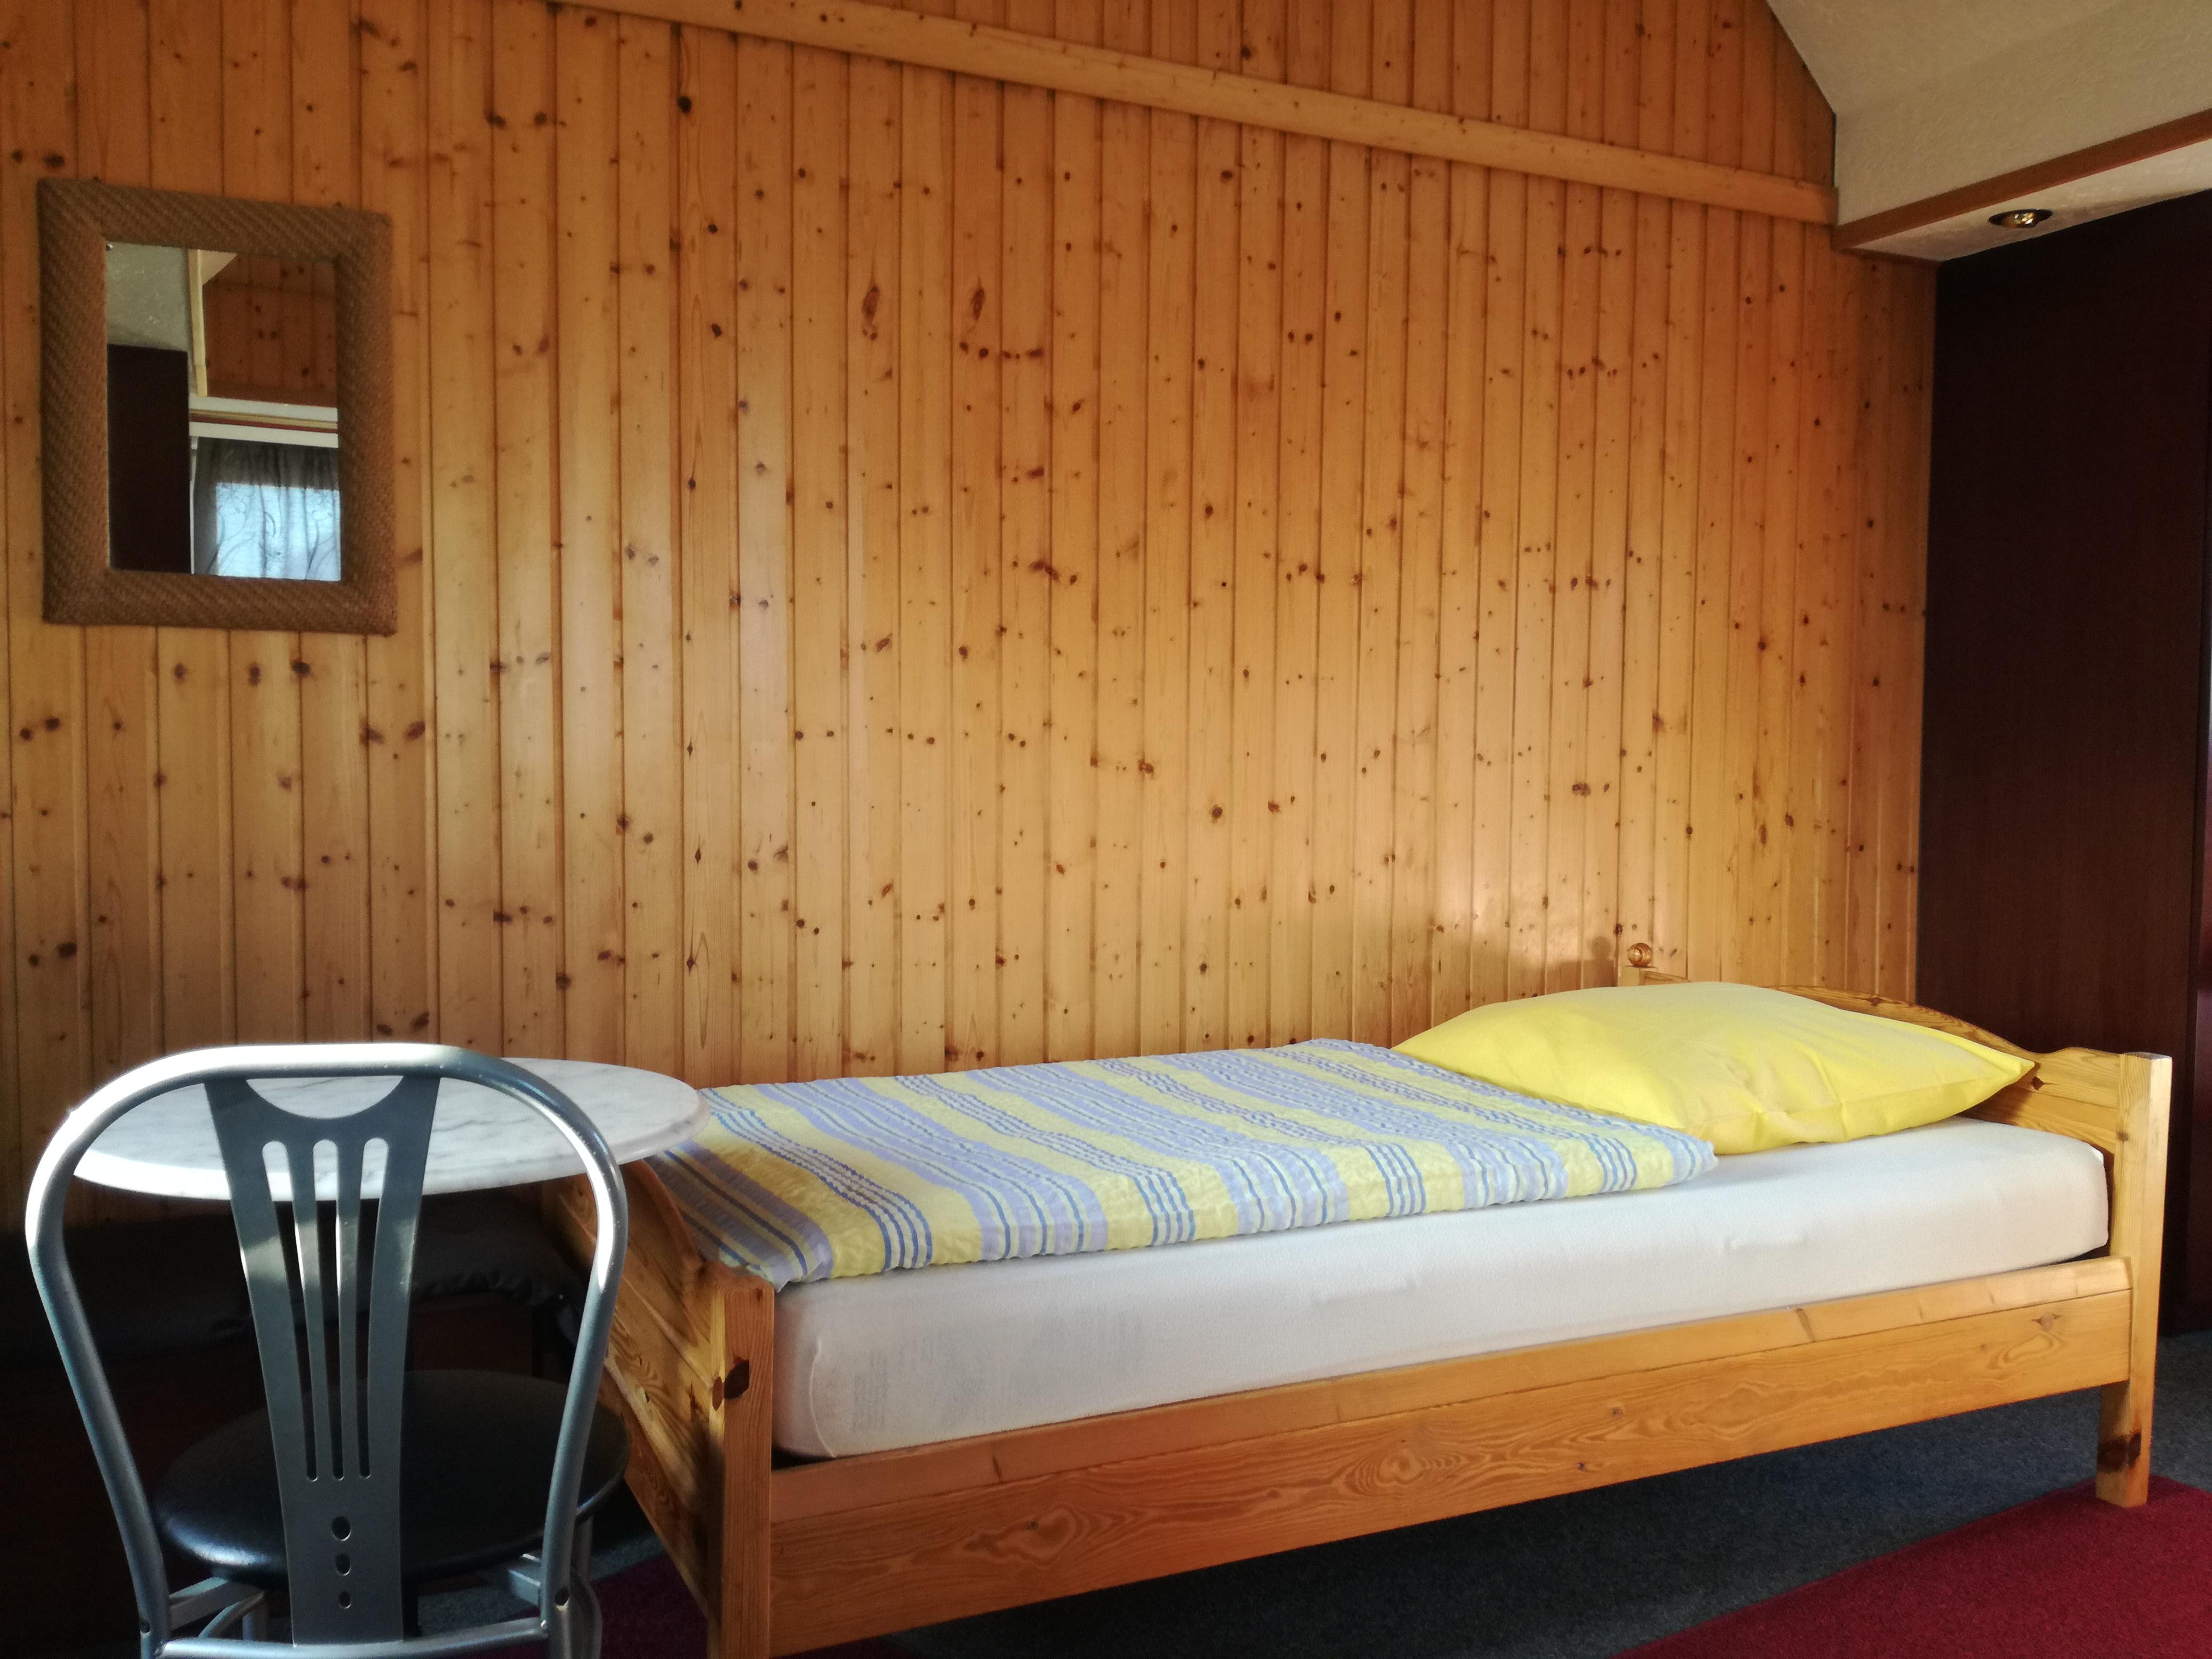 Mehrbettzimmer max 5 betten zimmer hannover for Zimmer hannover